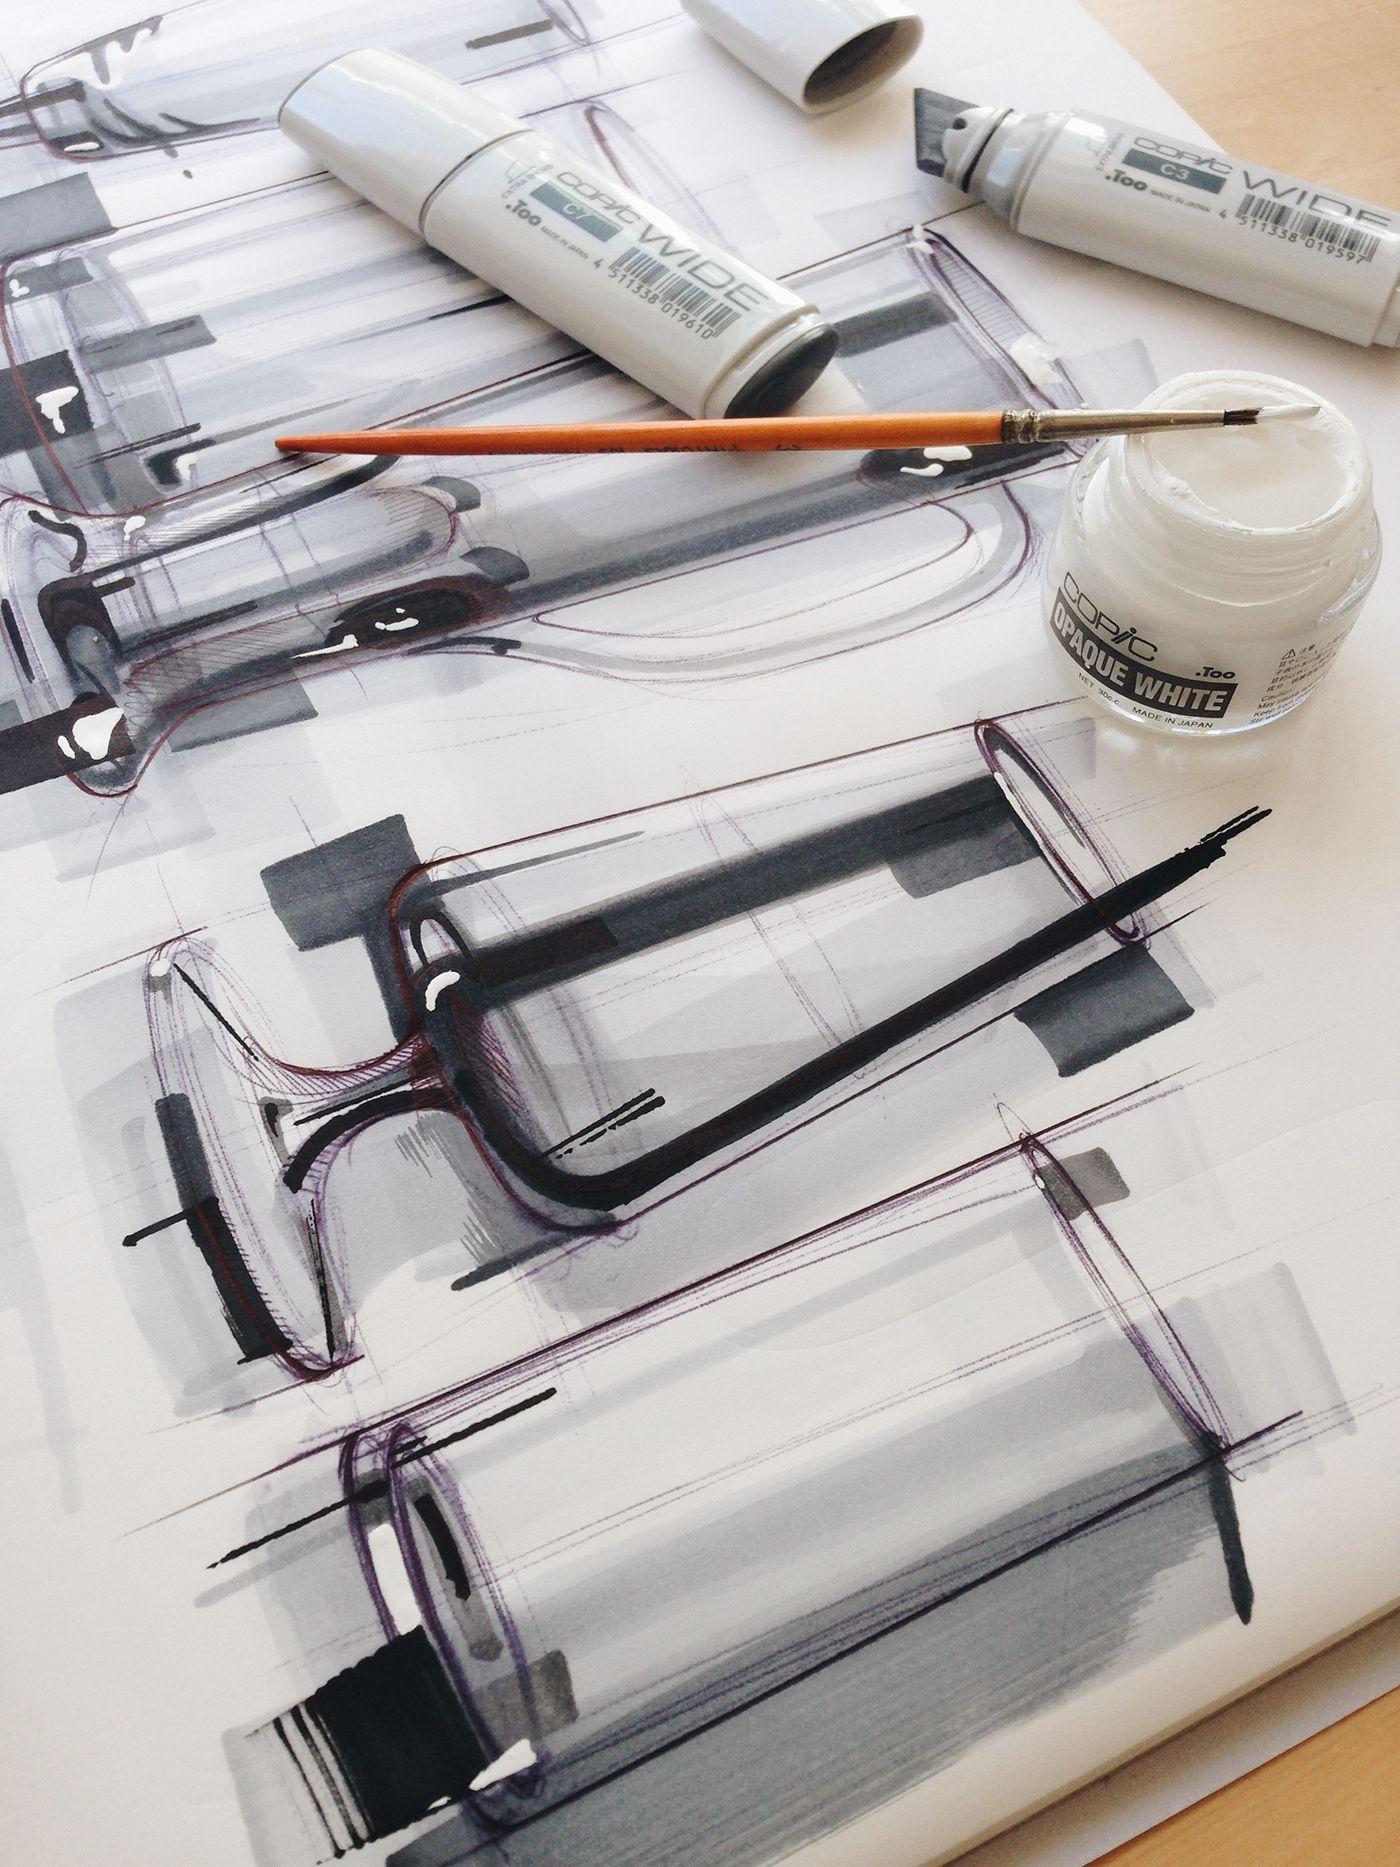 Industrial Design: Industrial Design Sketching And Marker Rendering Works